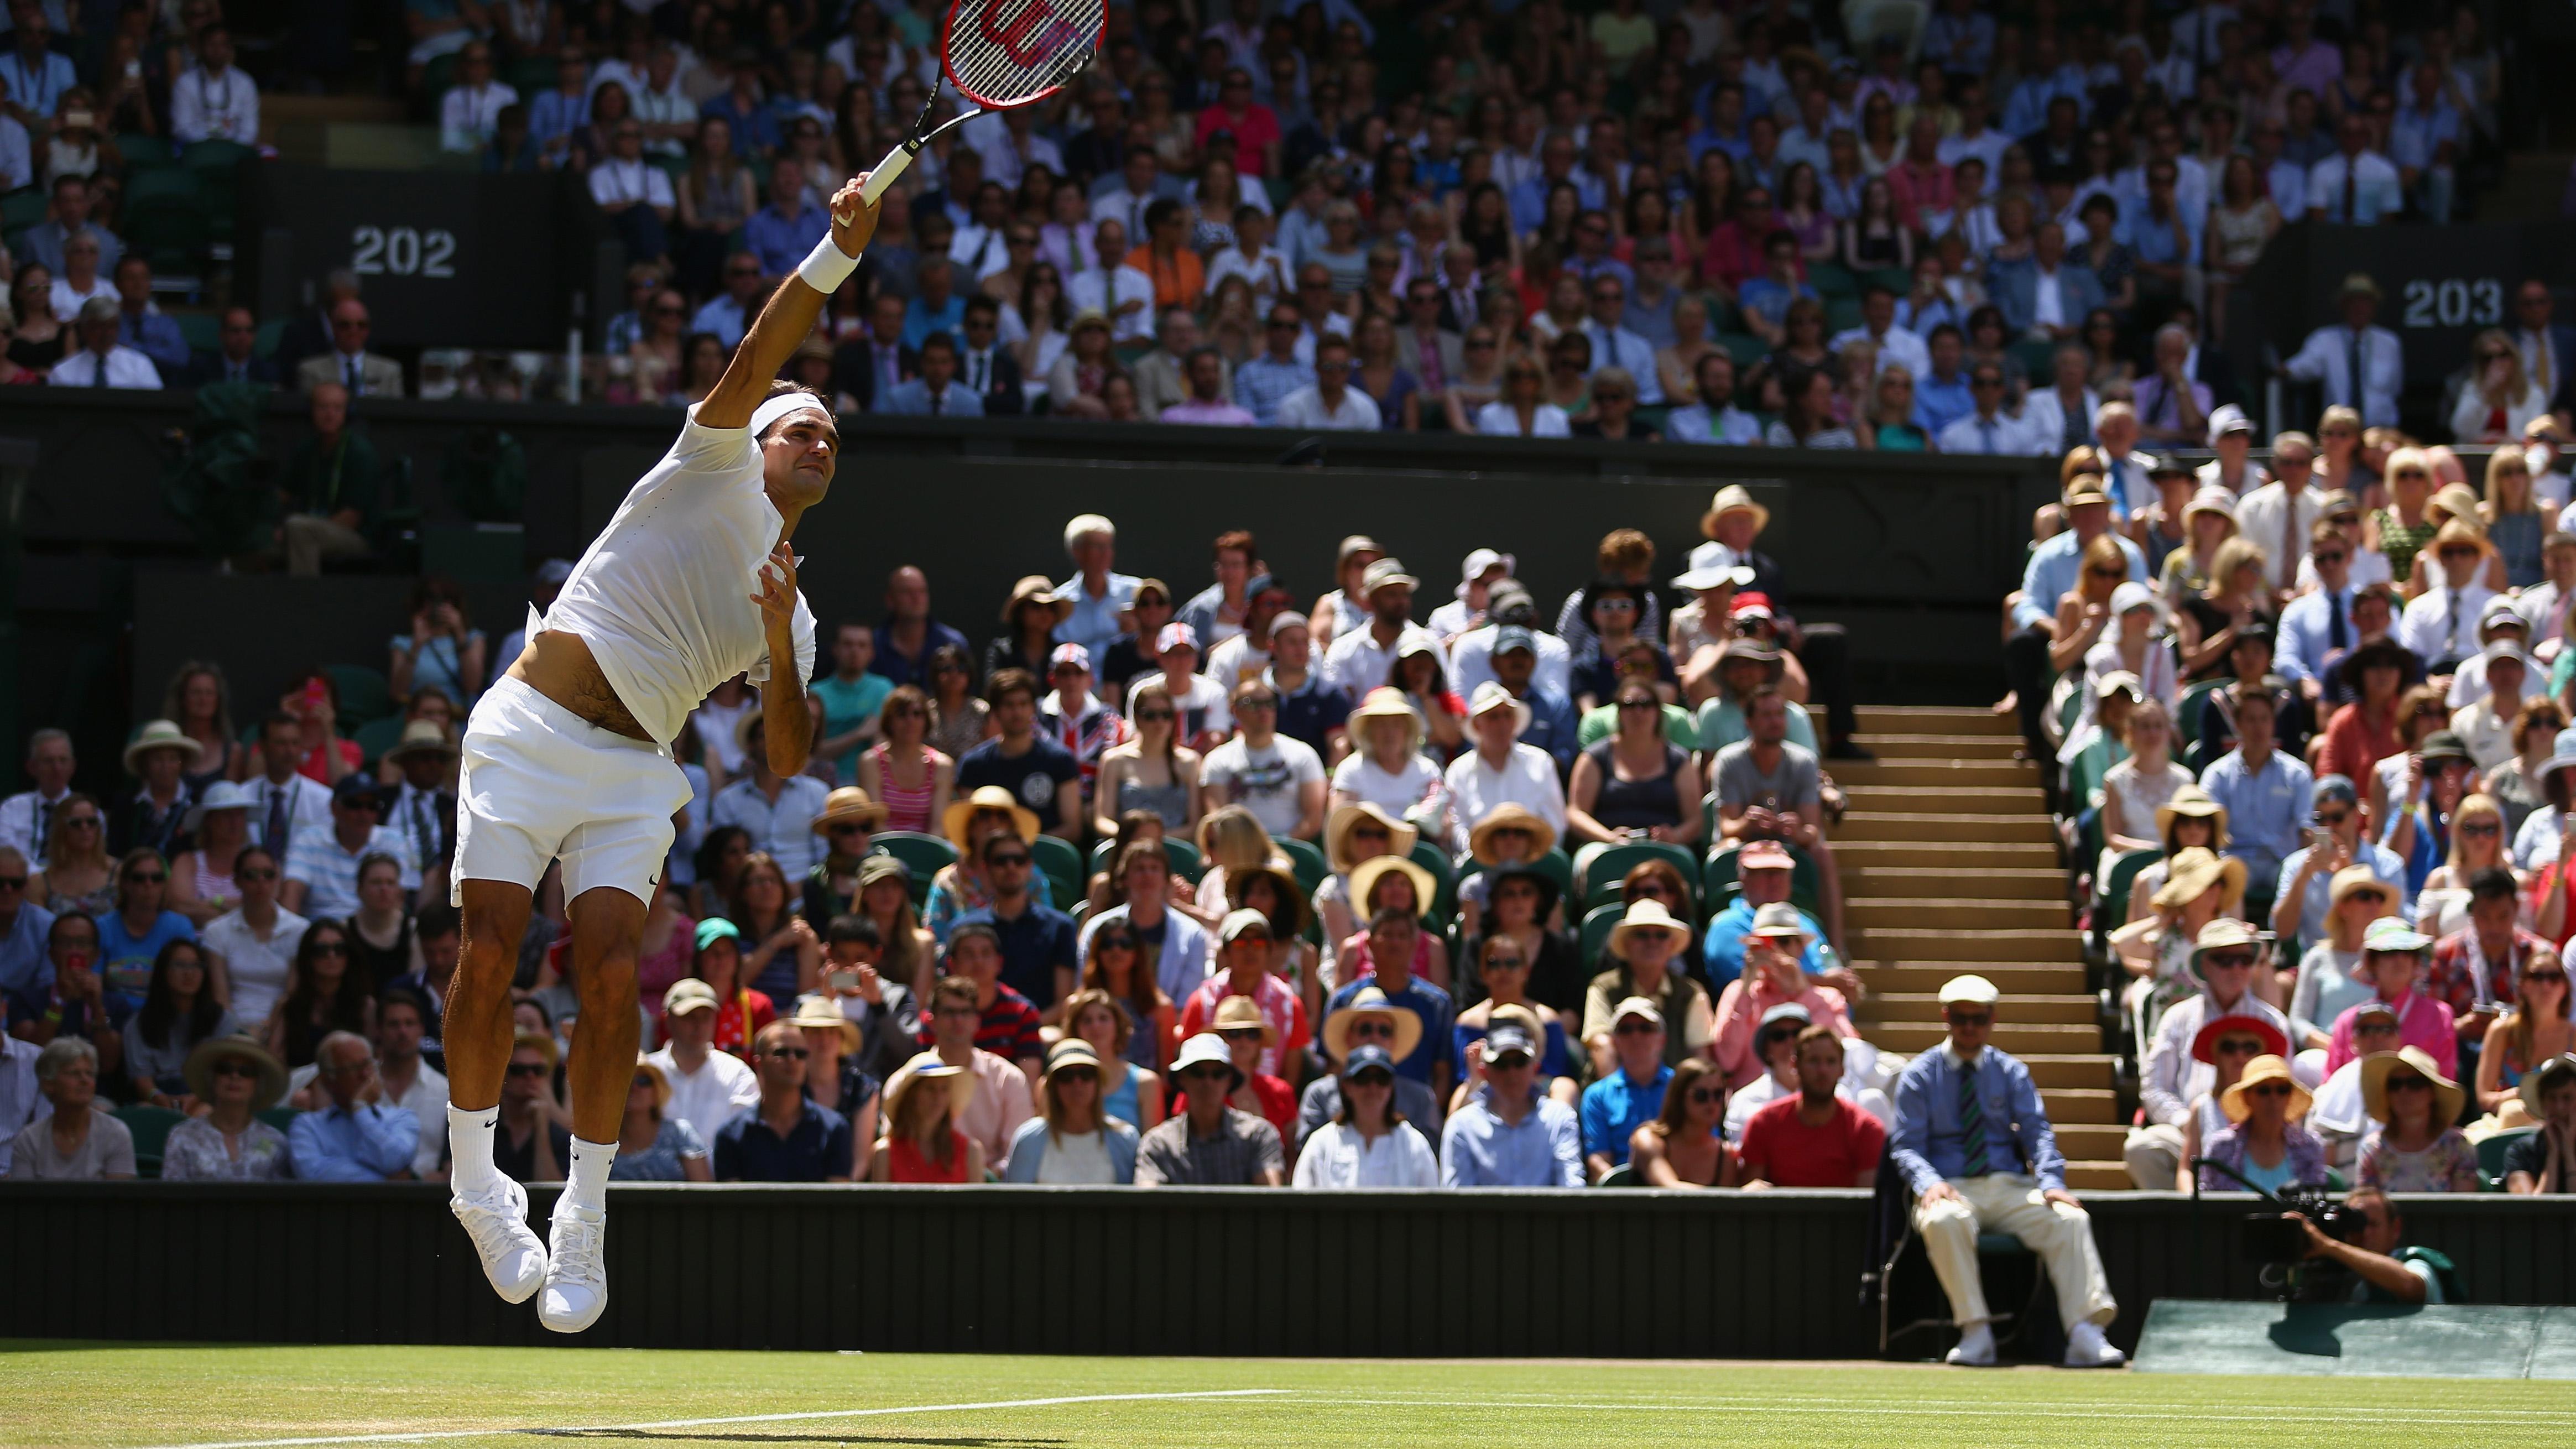 Daily Data Viz: Roger Federer serve stats at Wimbledon | SI.com